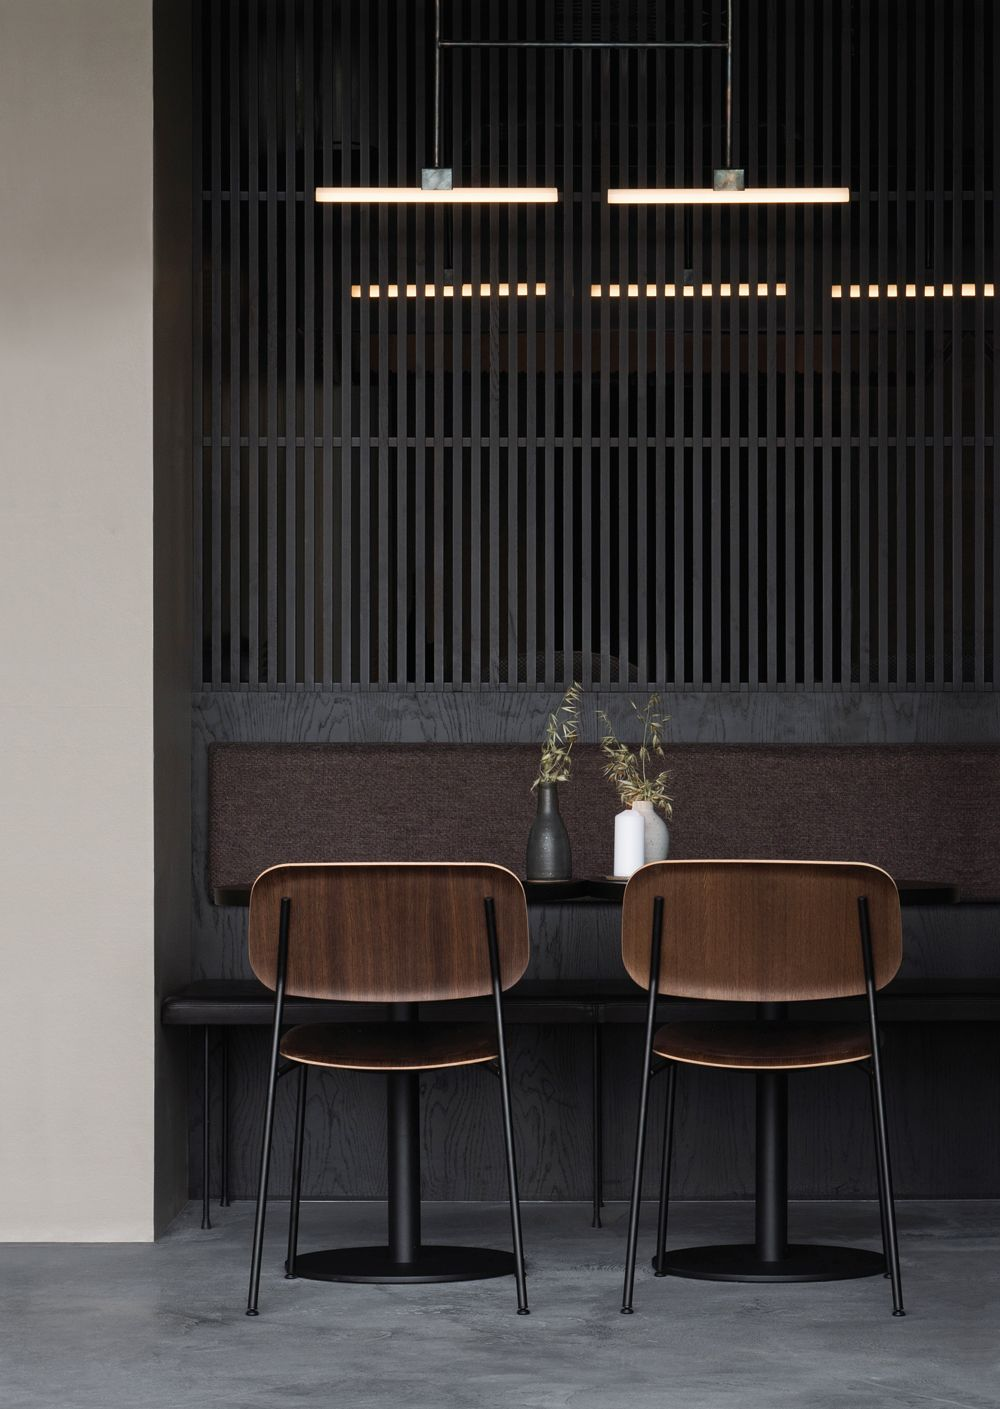 The Nærvær restaurant in Copenhagen, designed by Norm Architects